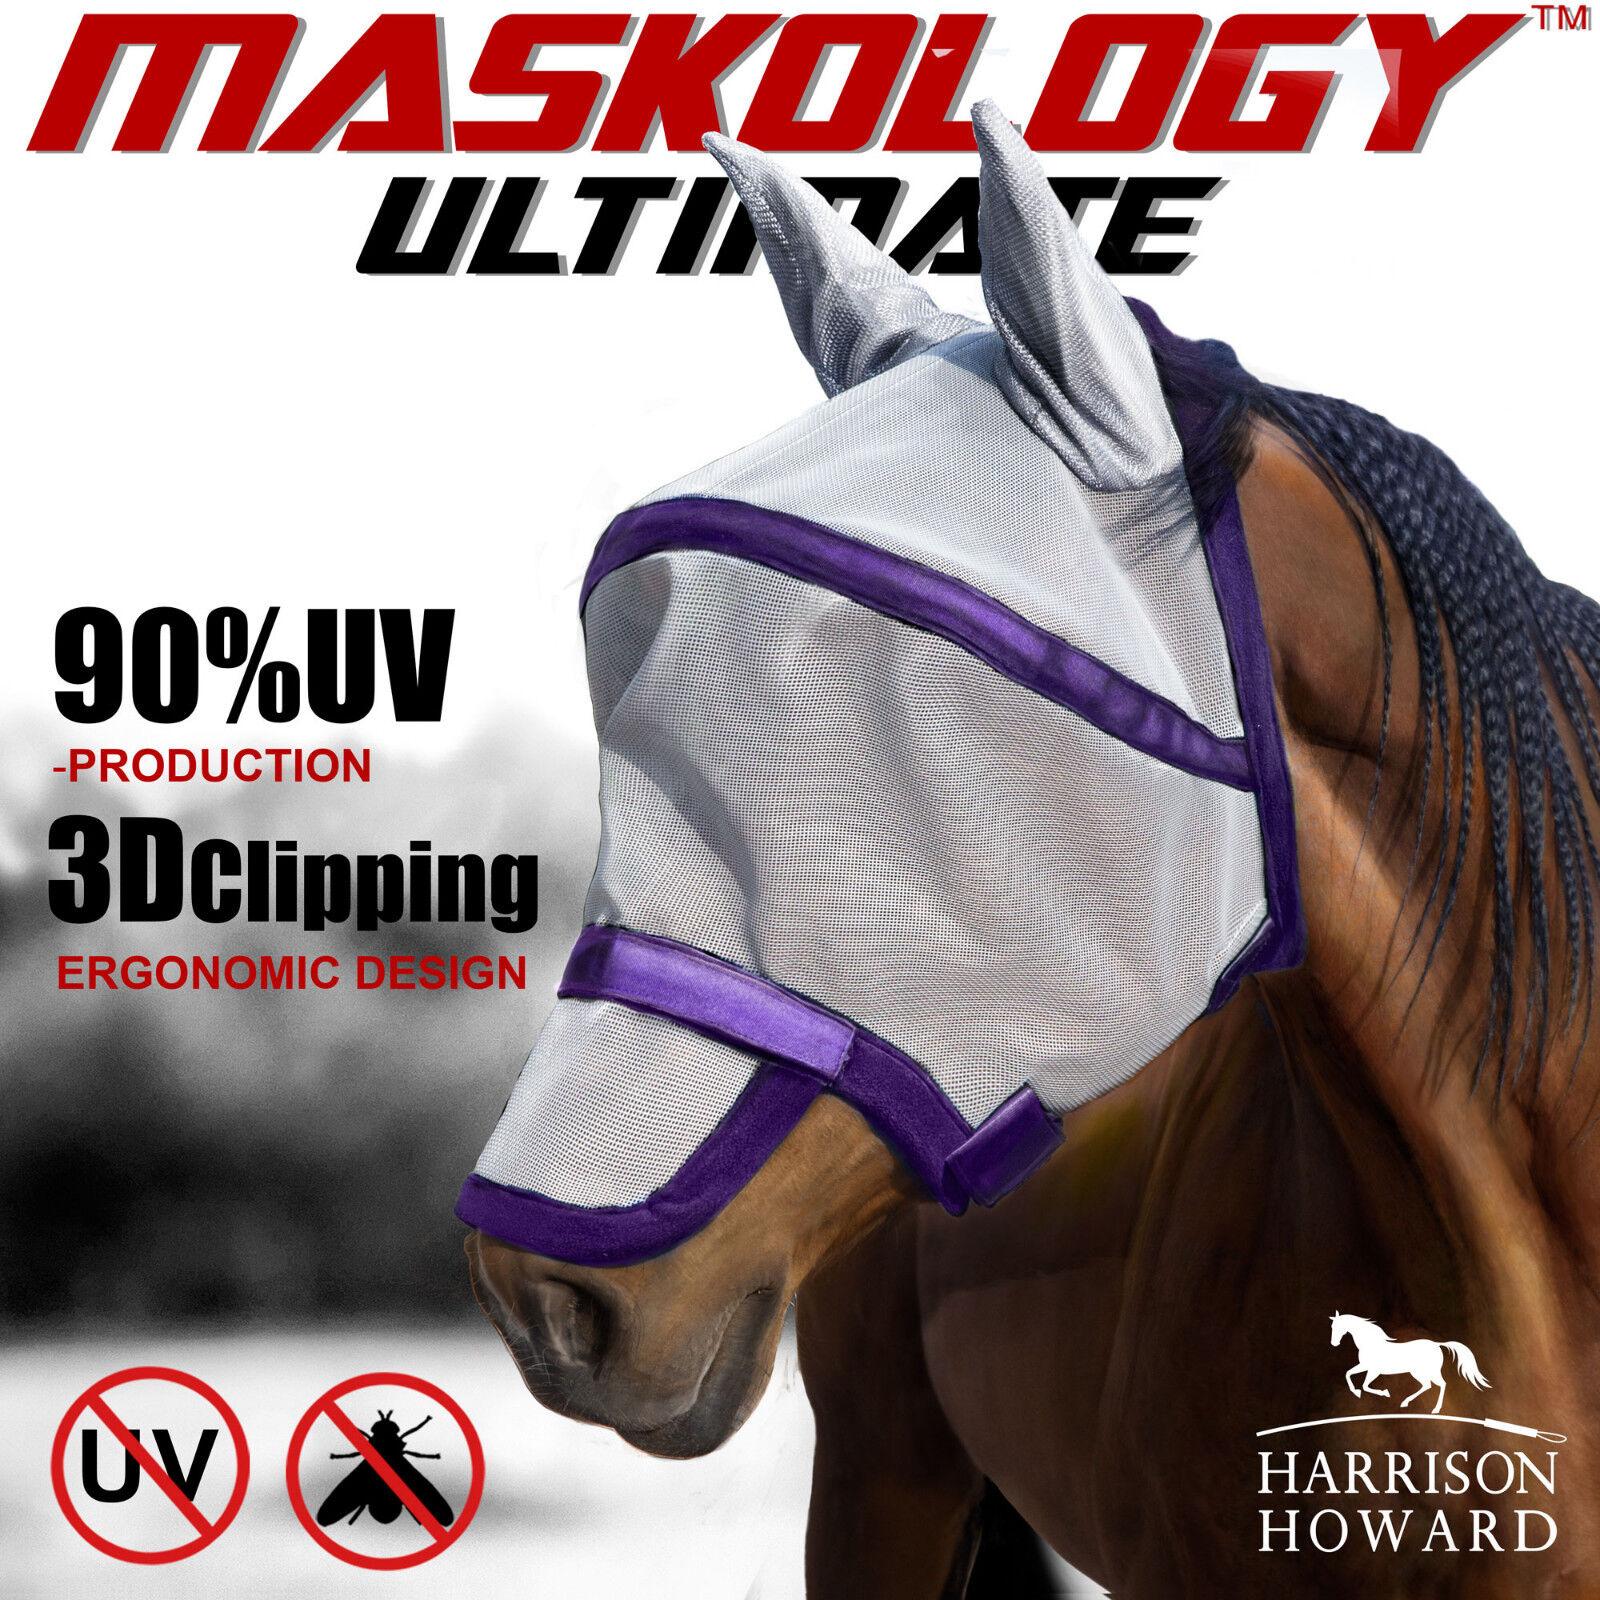 Harrison Howard caremaster Fly Masque Visage Complet Anti-UV envoi gratuit